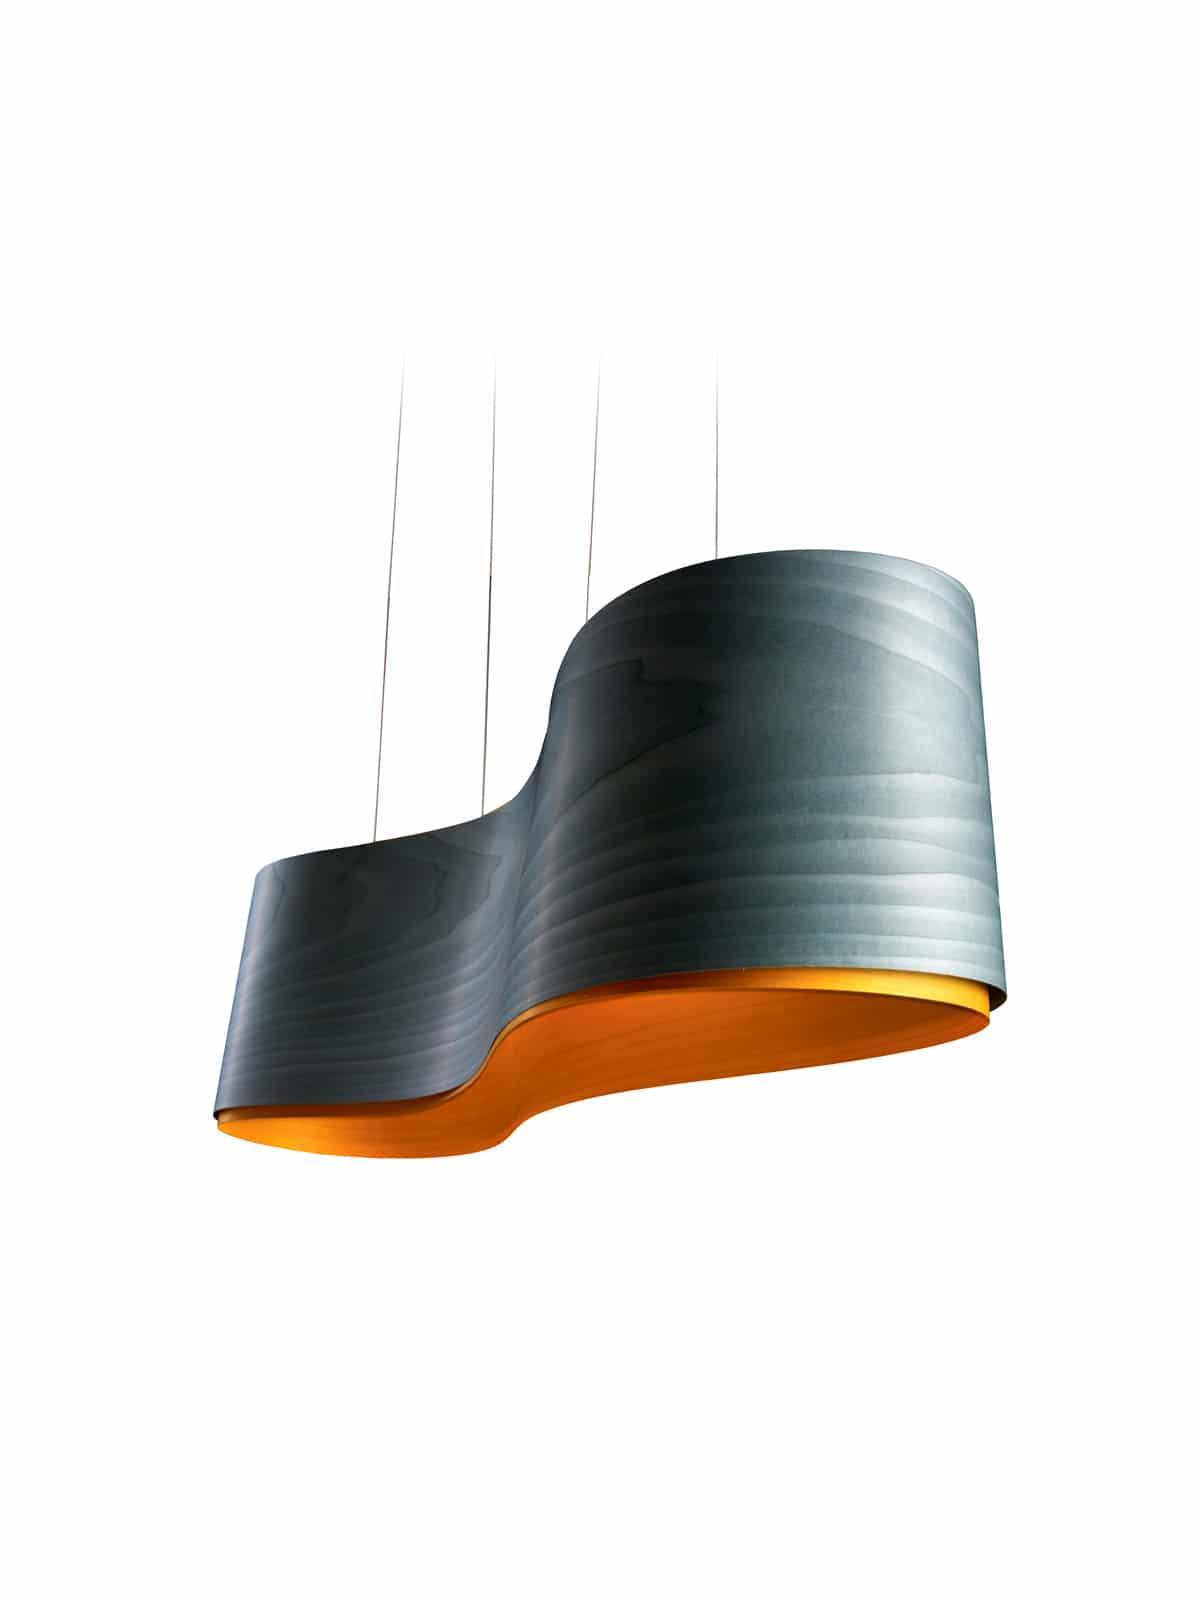 NEW WAVE LED - Lampen Leuchten Designerleuchten Online Berlin Design